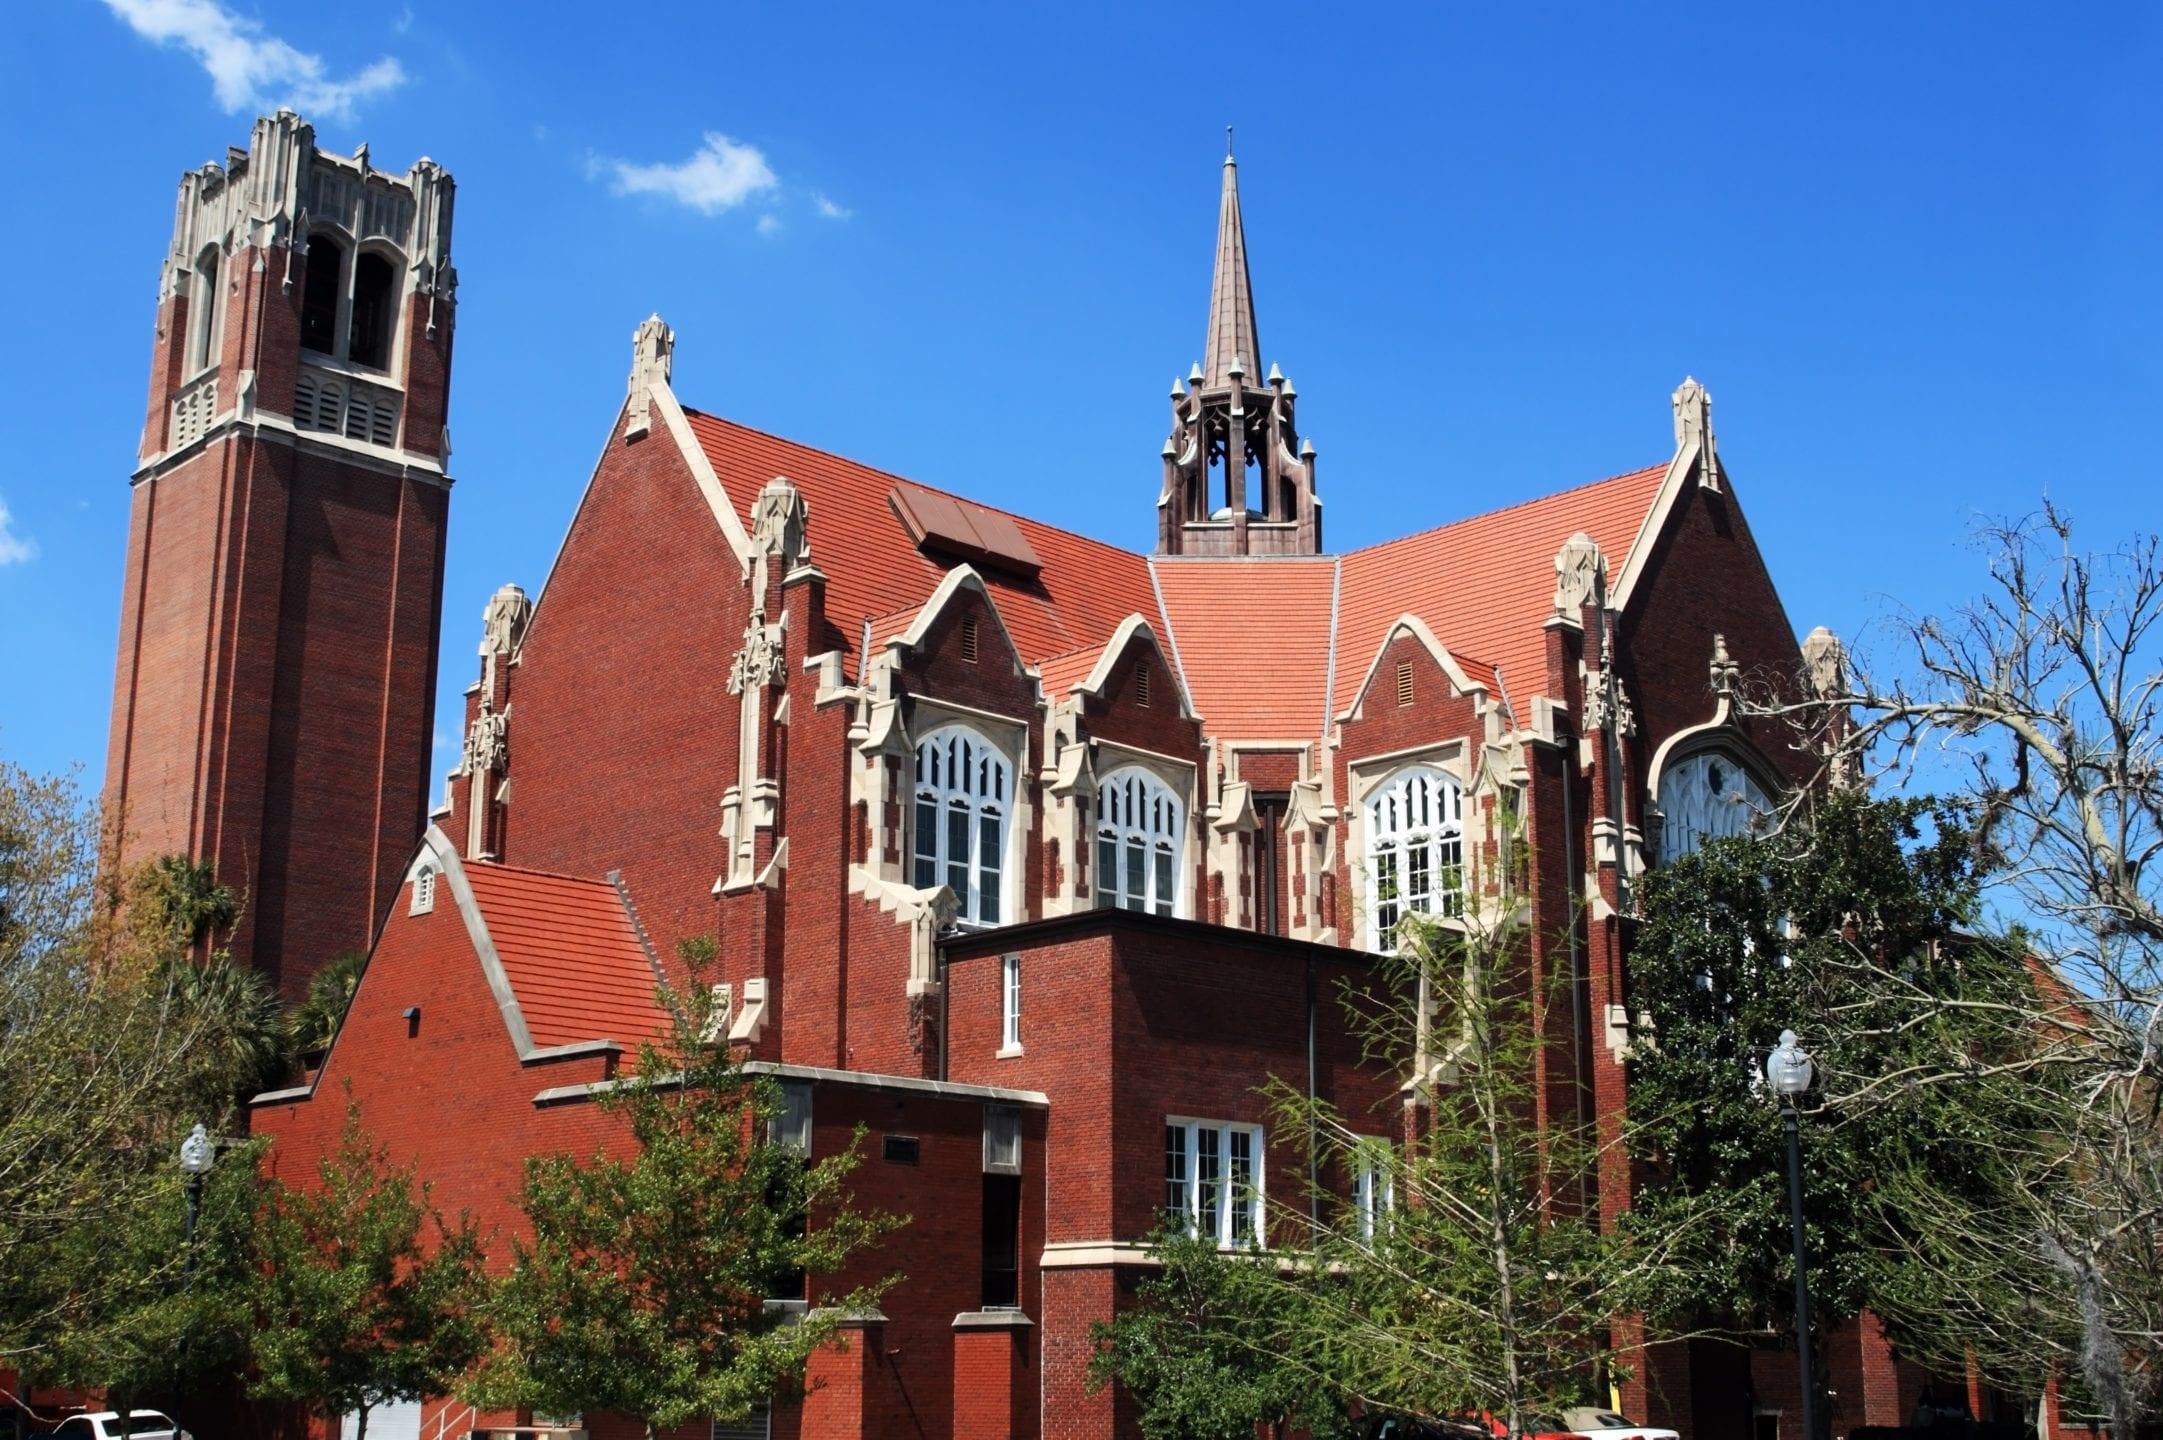 University of Florida Ludowici Roof Tile